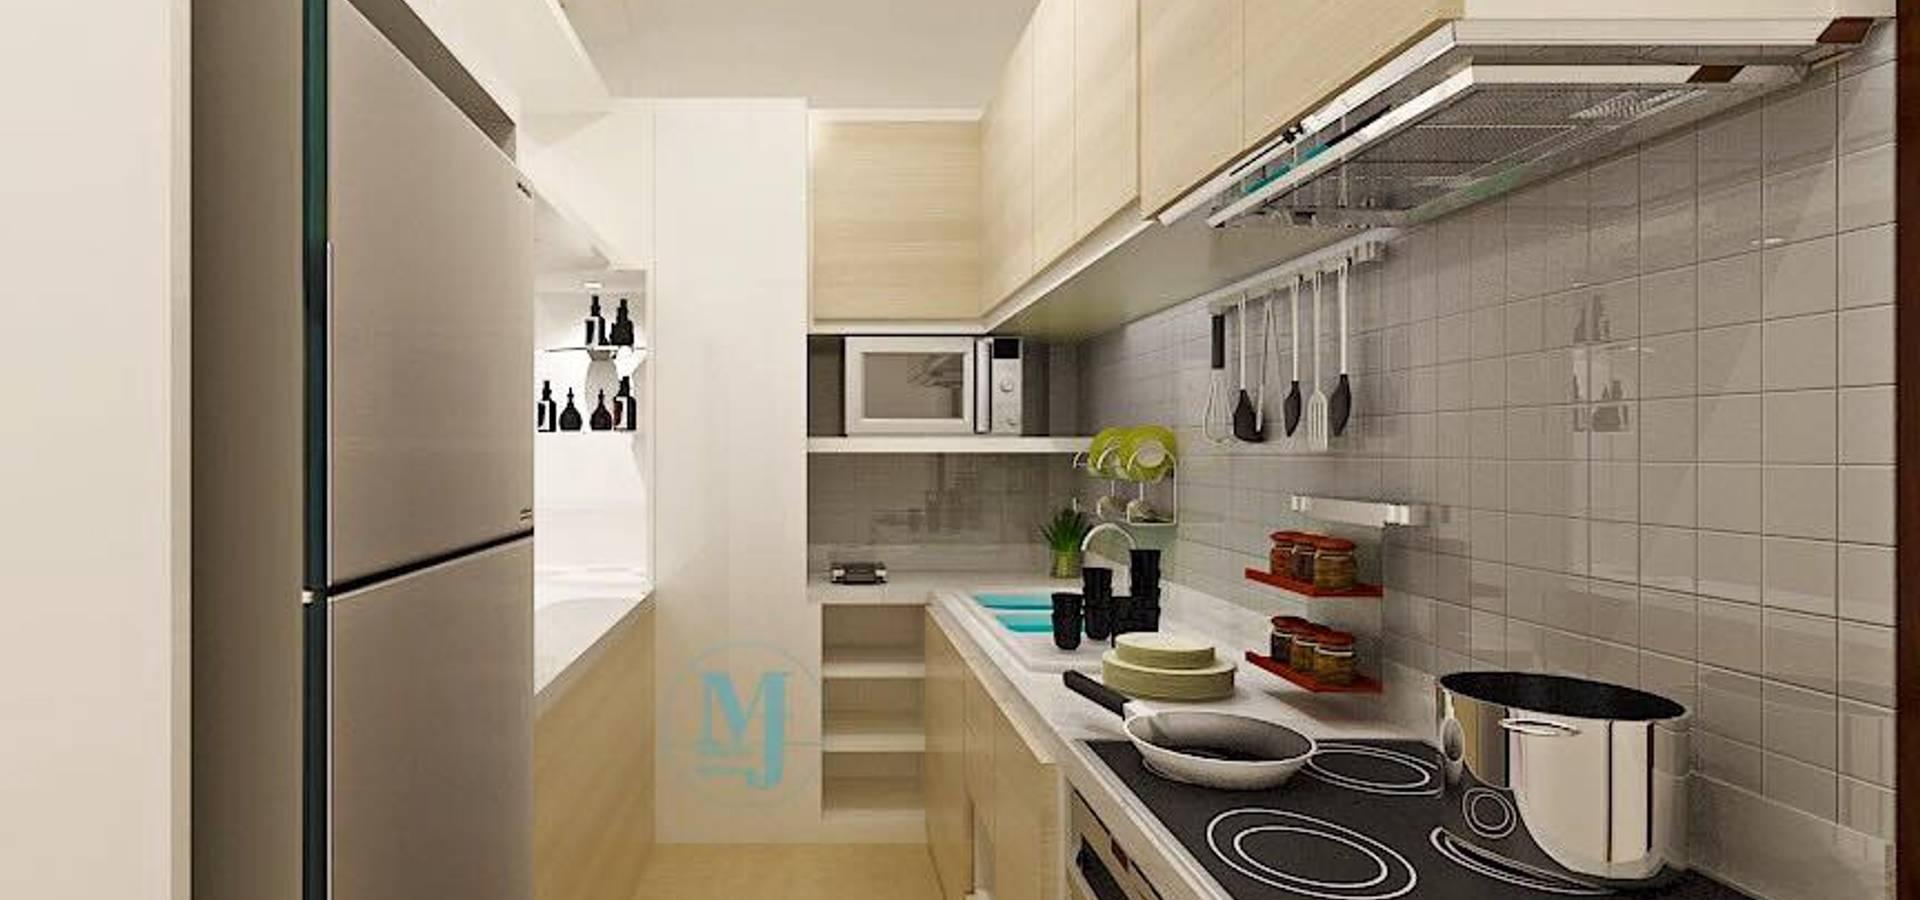 MJ interior design